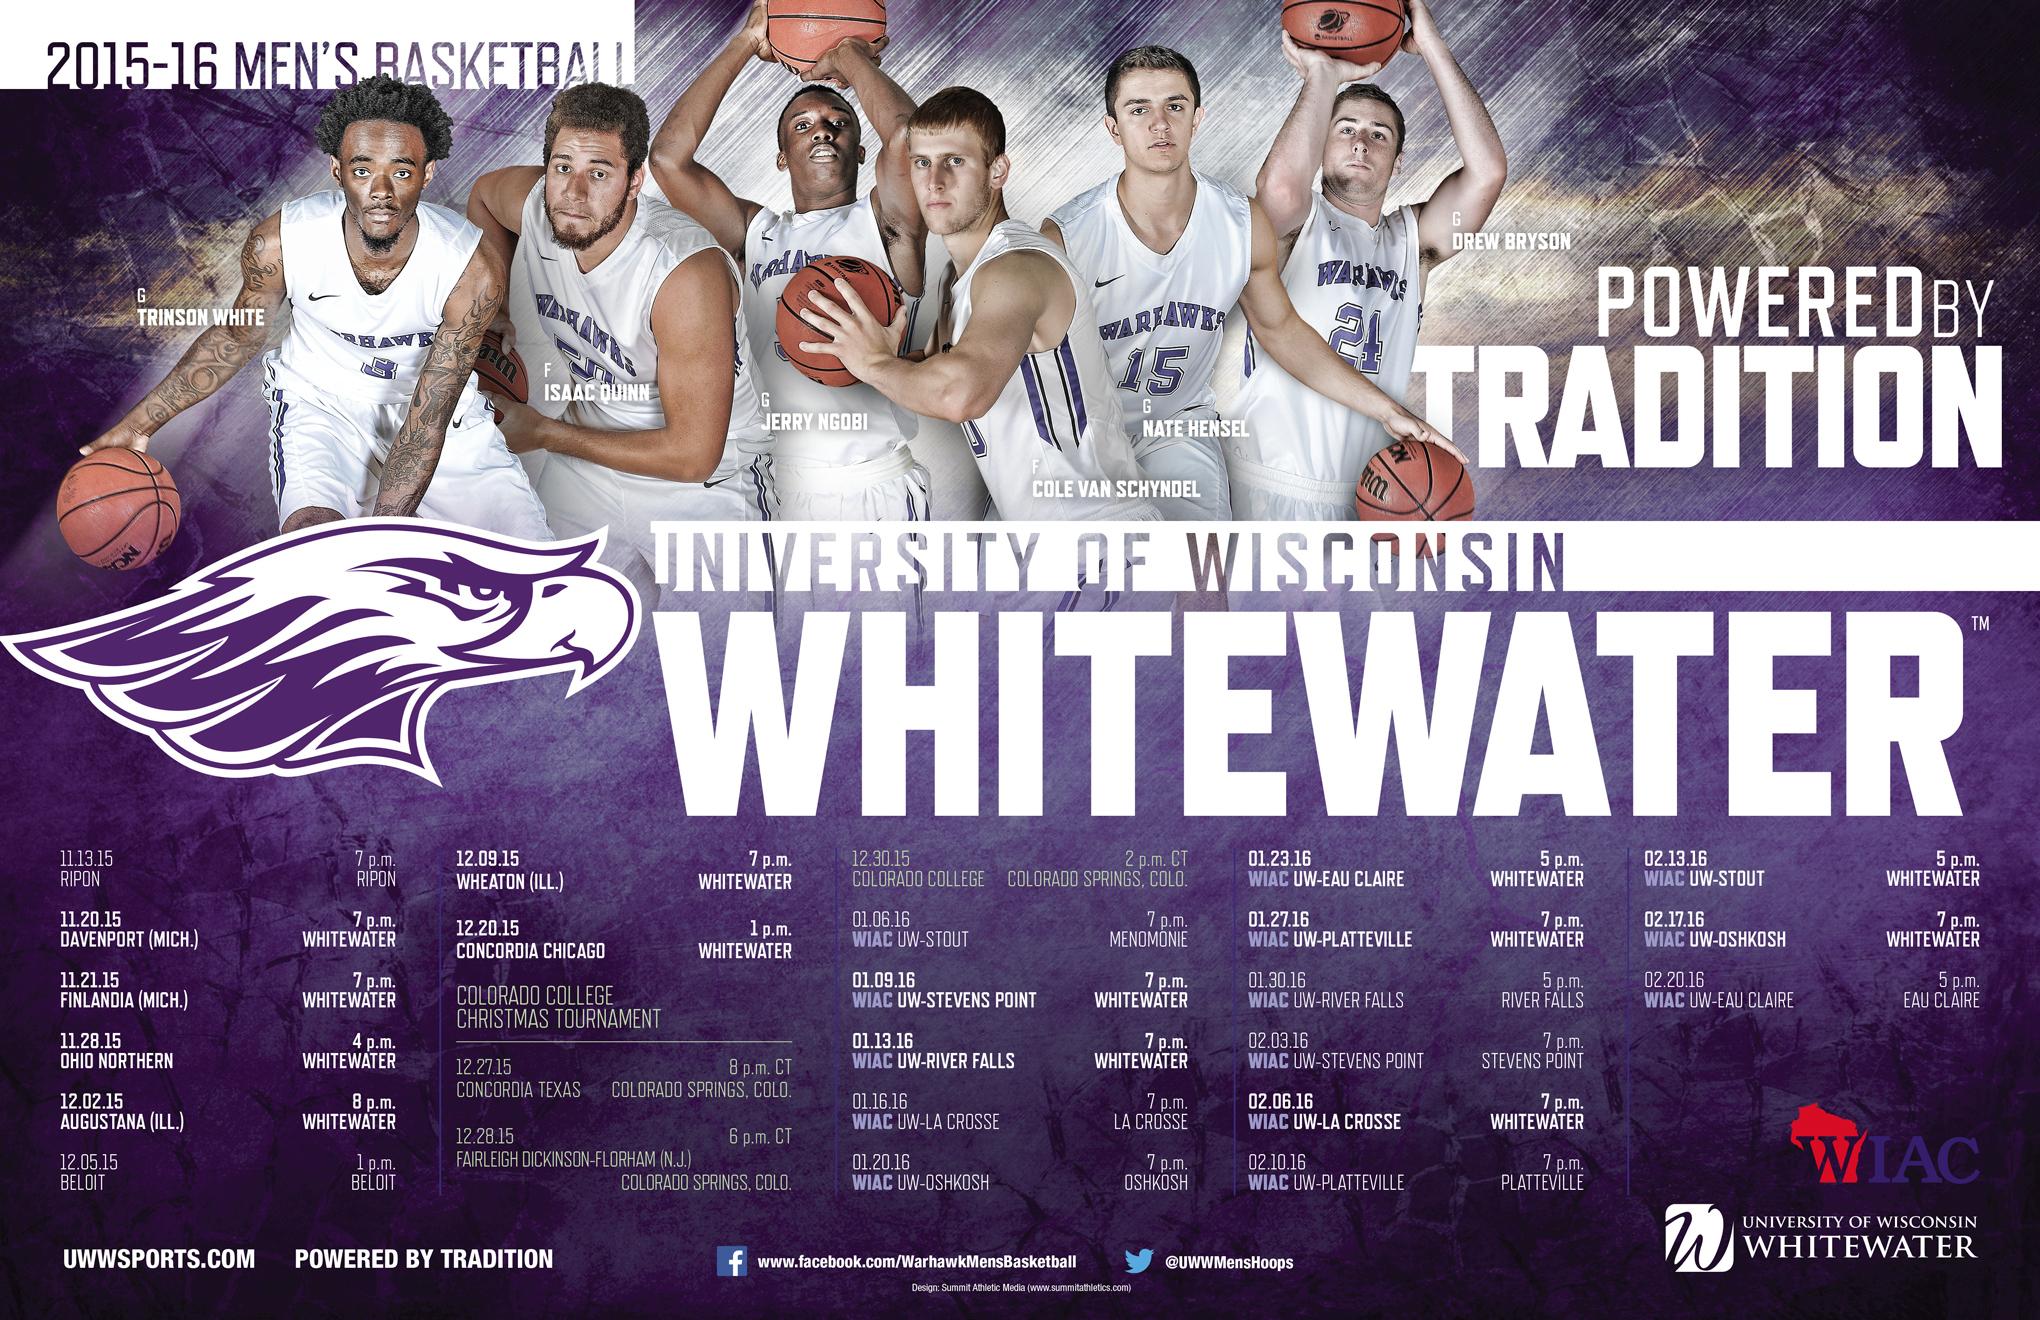 1447779341 2015 uw whitewater men's basketball poster final